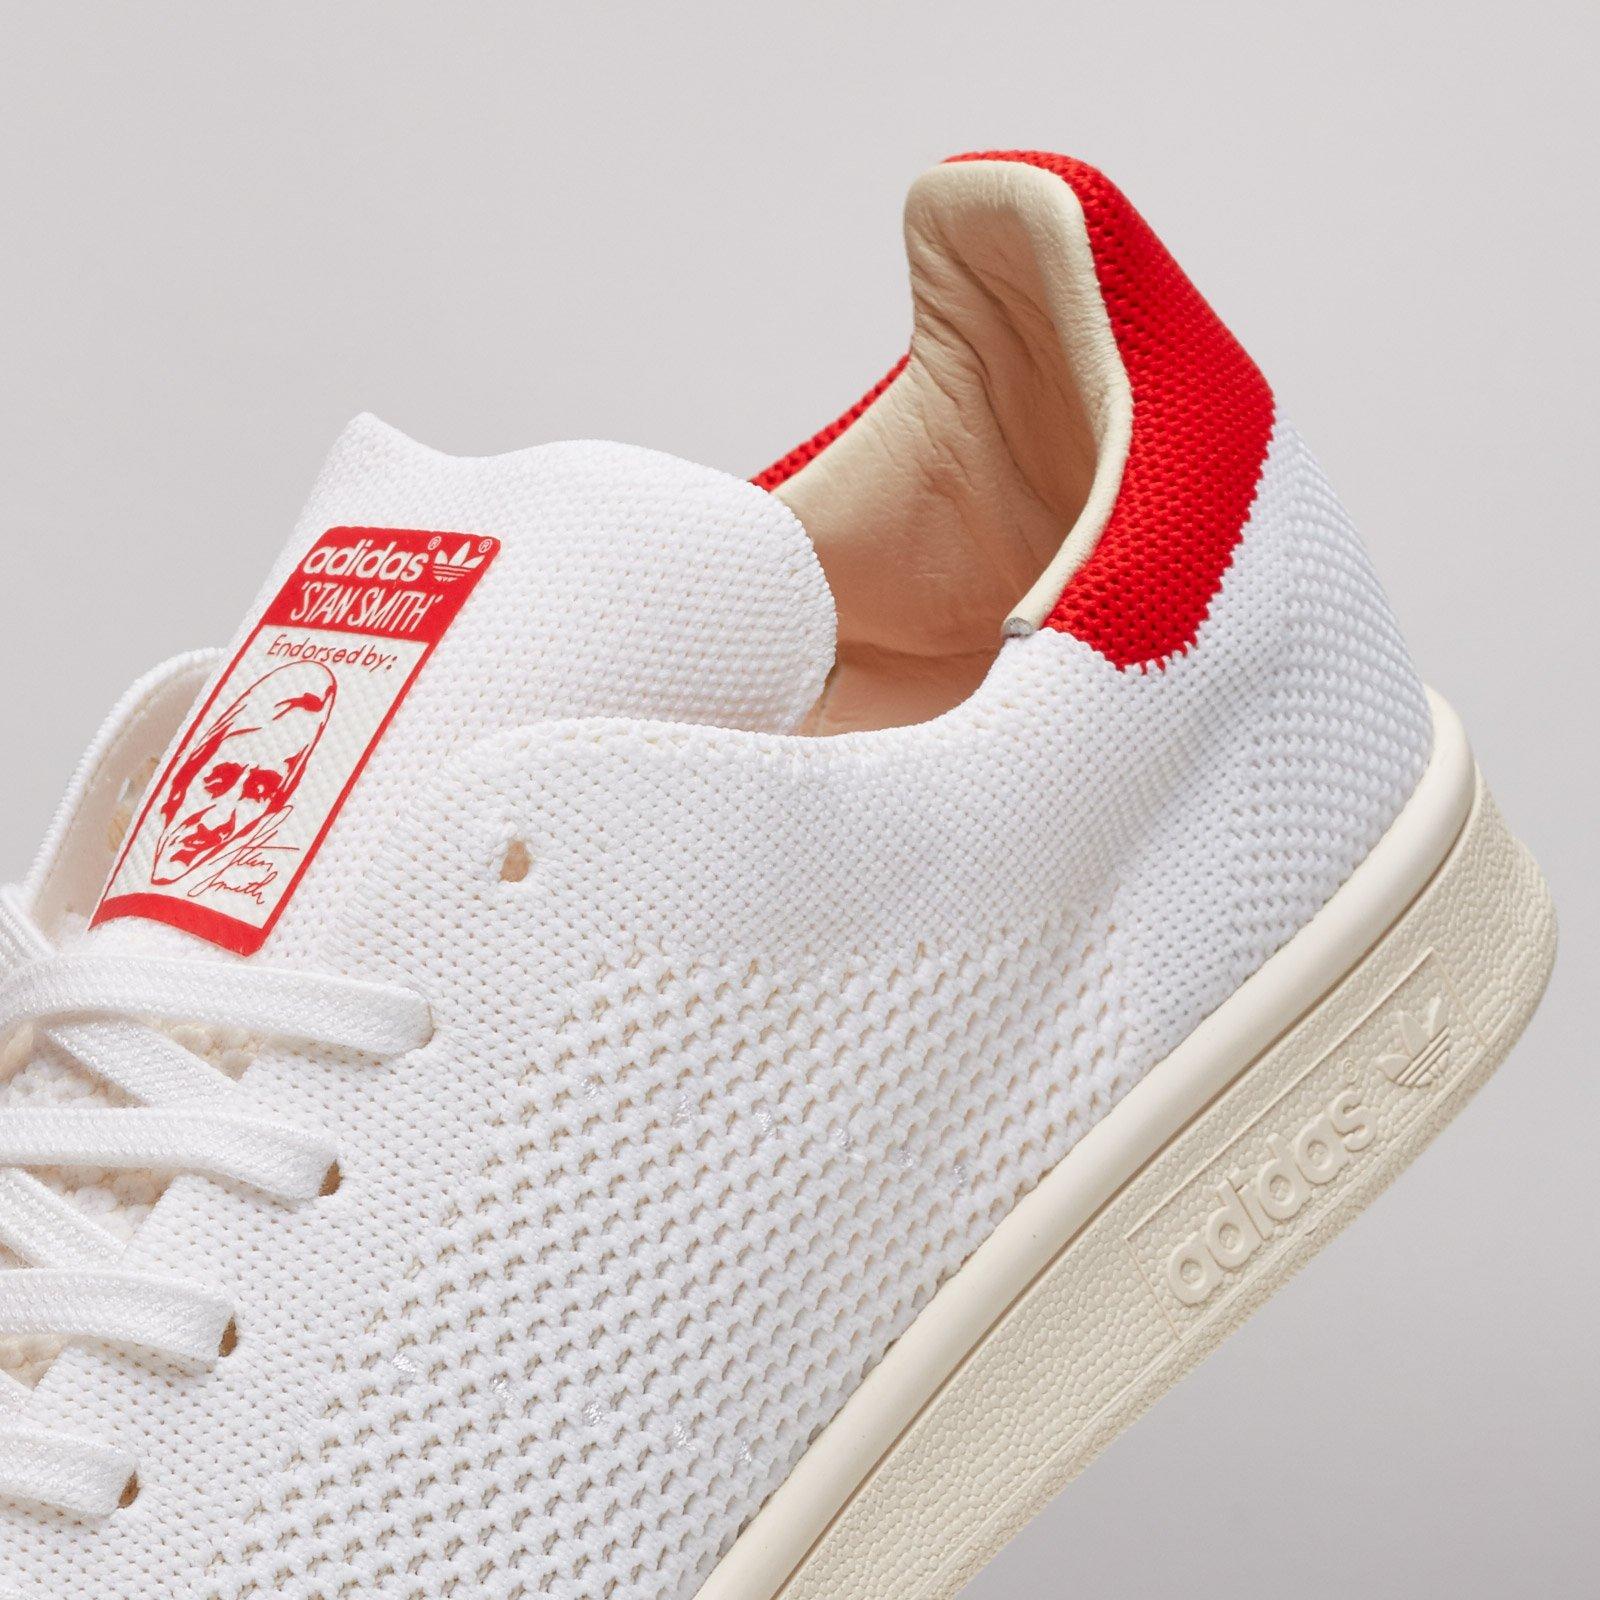 adidas stan smith og pk s75147 sneakersnstuff scarpe